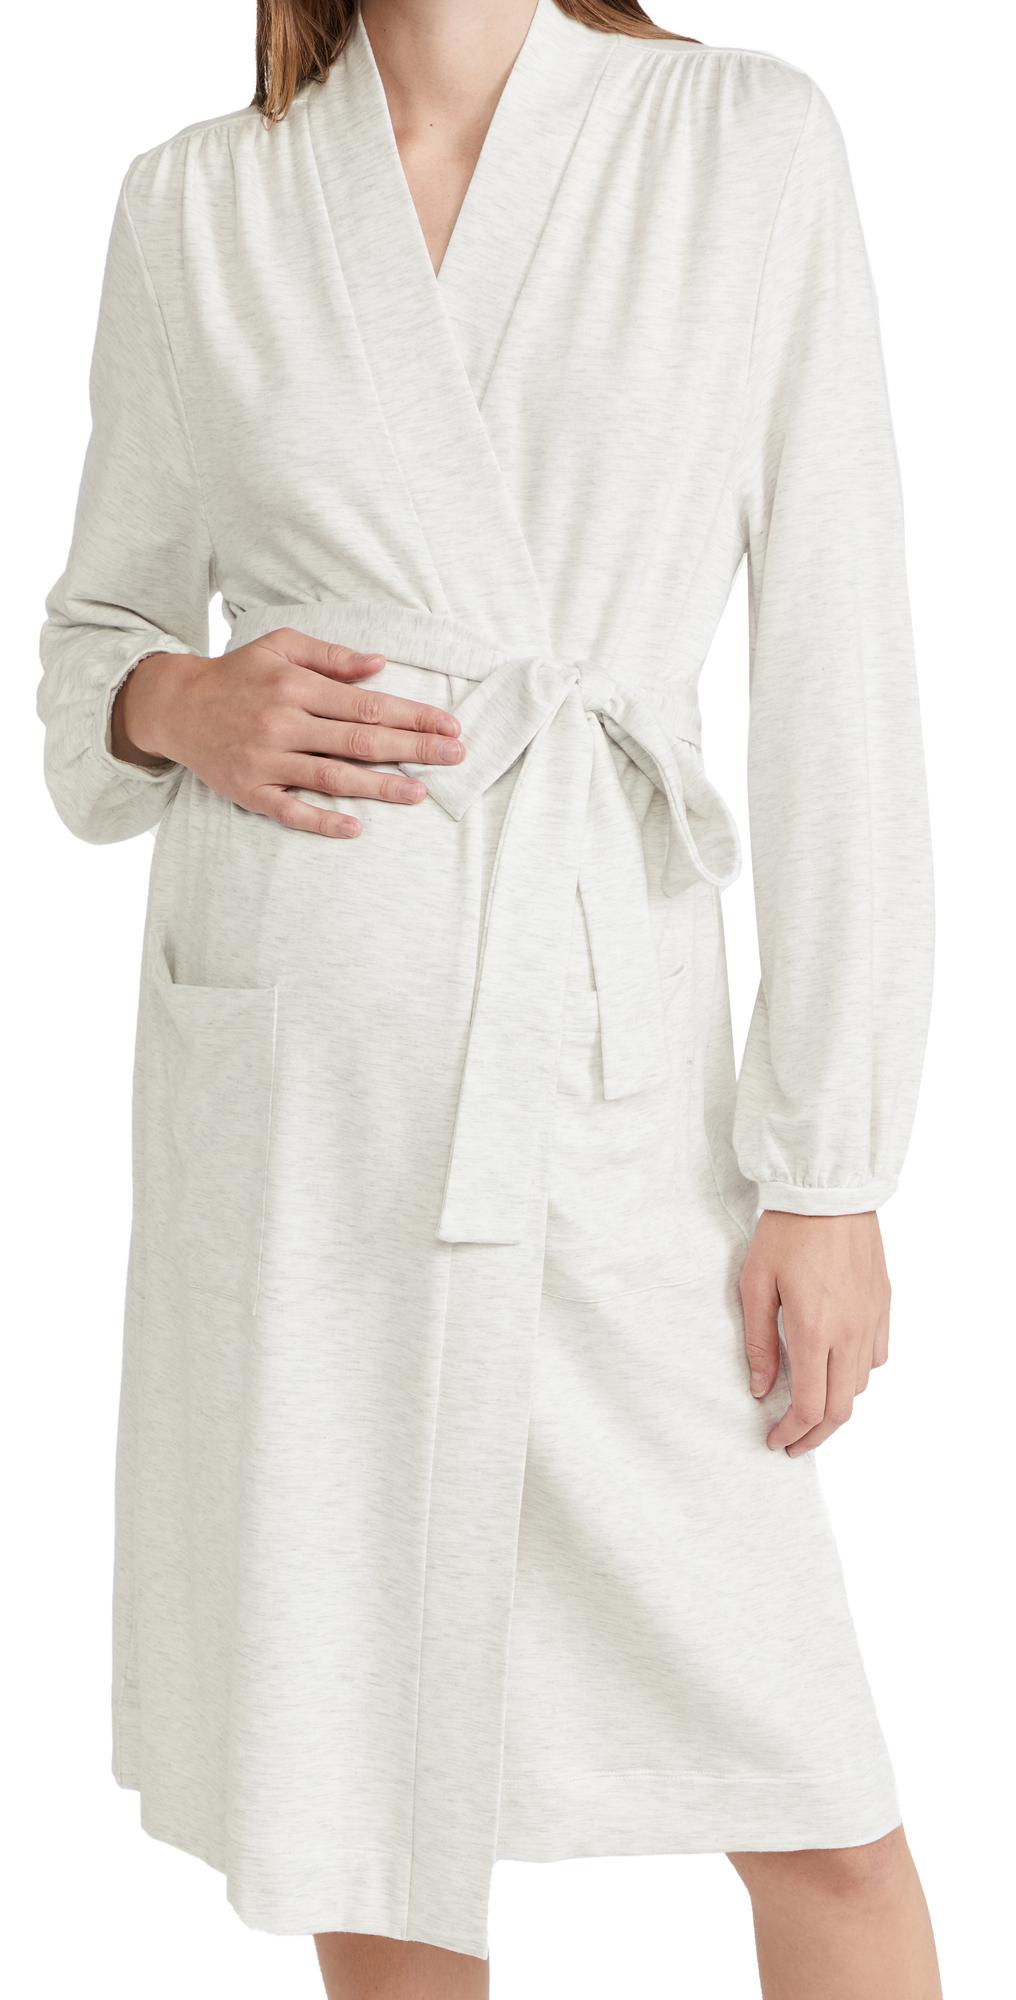 The Nesting Robe